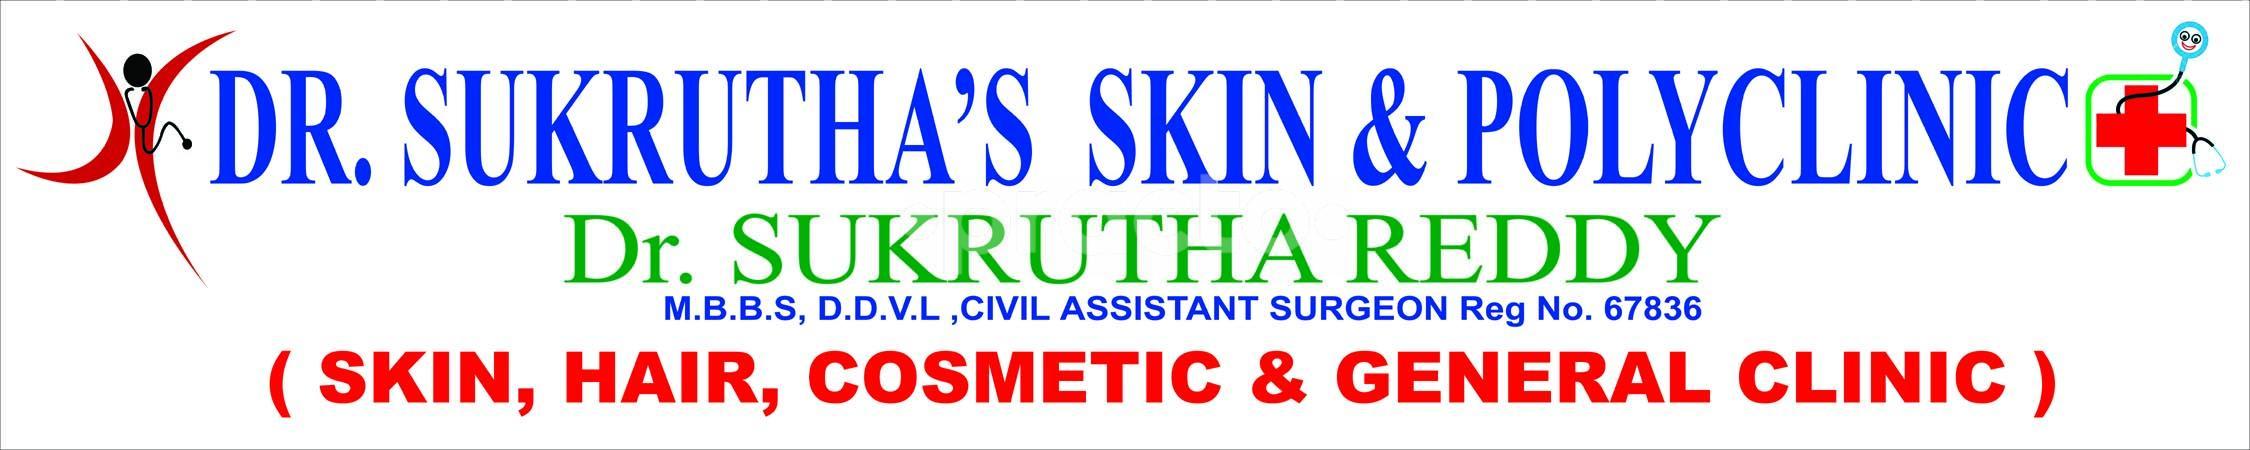 Dr Sukrutha's Skin and Polyclinic